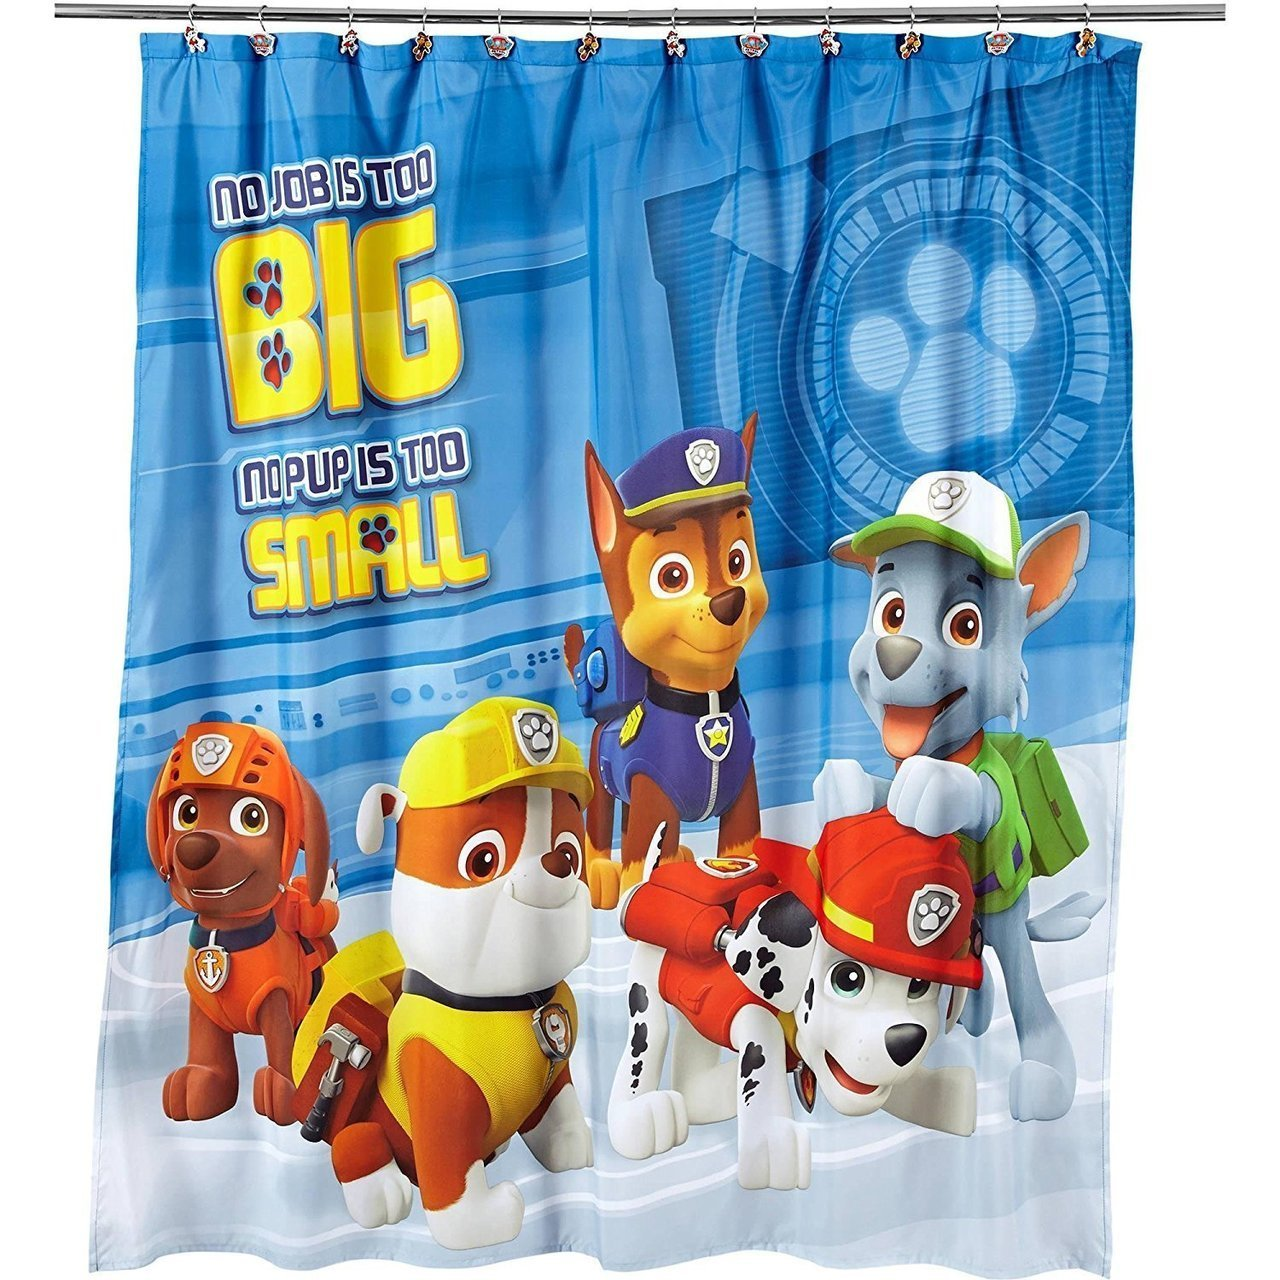 Wwe Bathroom Shower Curtain: Shop Kids Shower Curtains Online